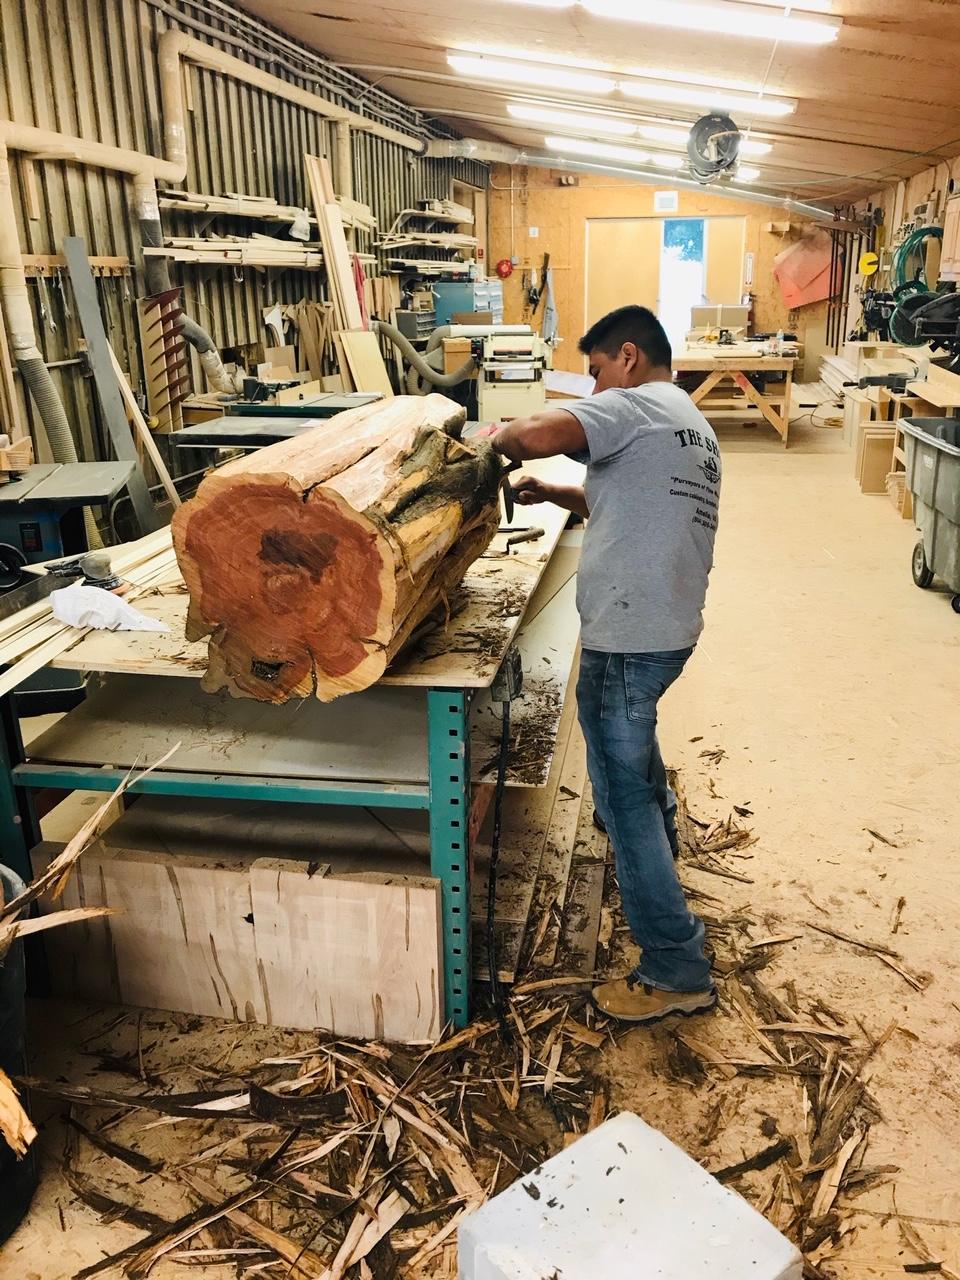 hardwood flooring, fall, 2020, dining room, One Room Challenge, One Room Challenge, engineered hardwoods, Lifecore, engineered hardwood floors